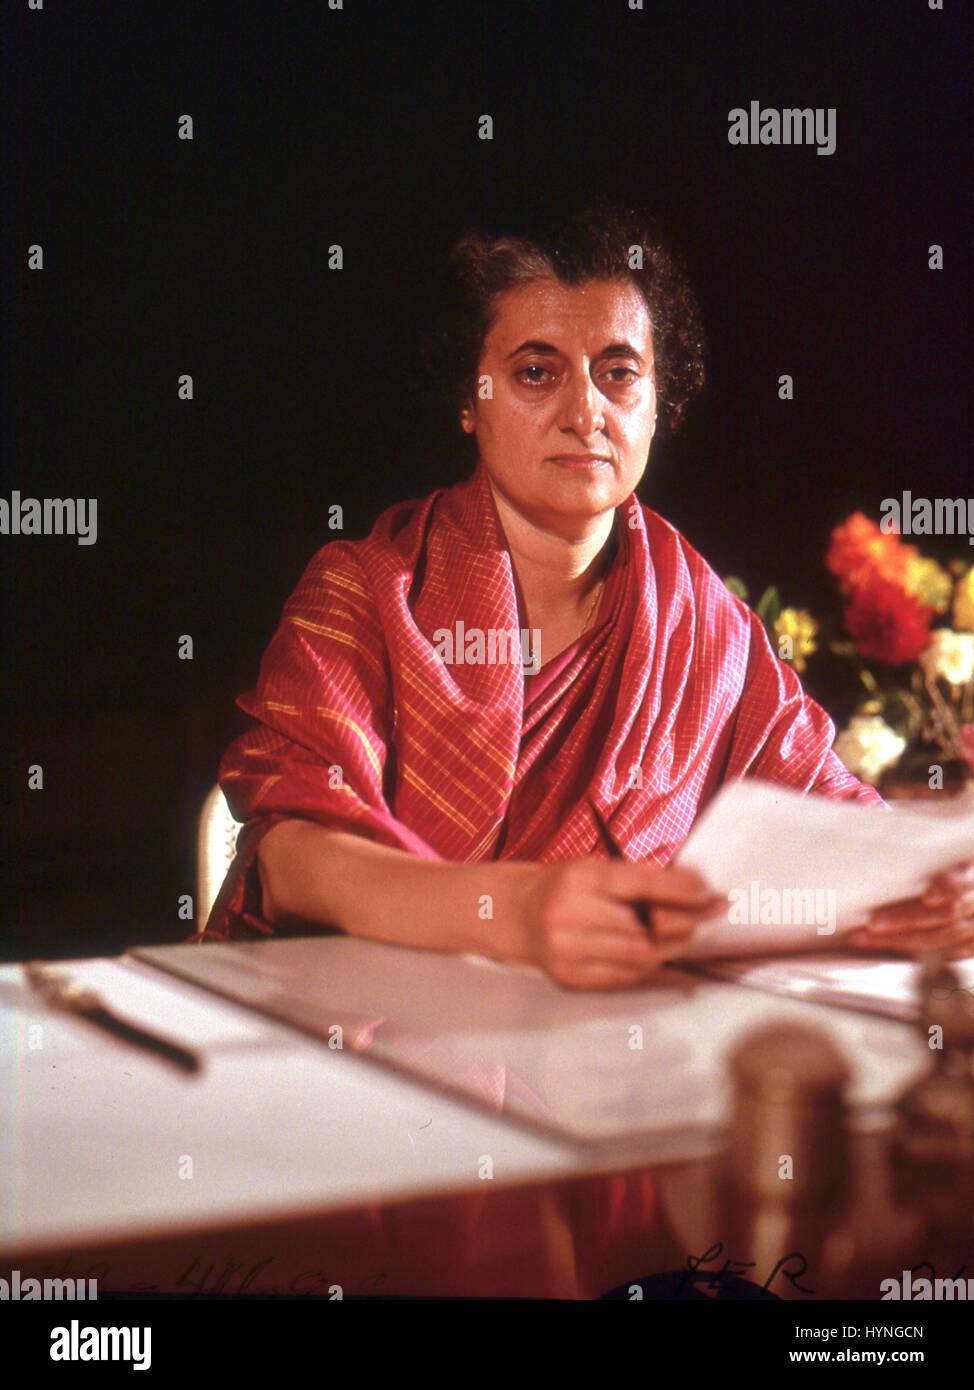 Mrs. Indira Ghandi (1917-1984), Prime Minister of India. Circa 1970. - Stock Image